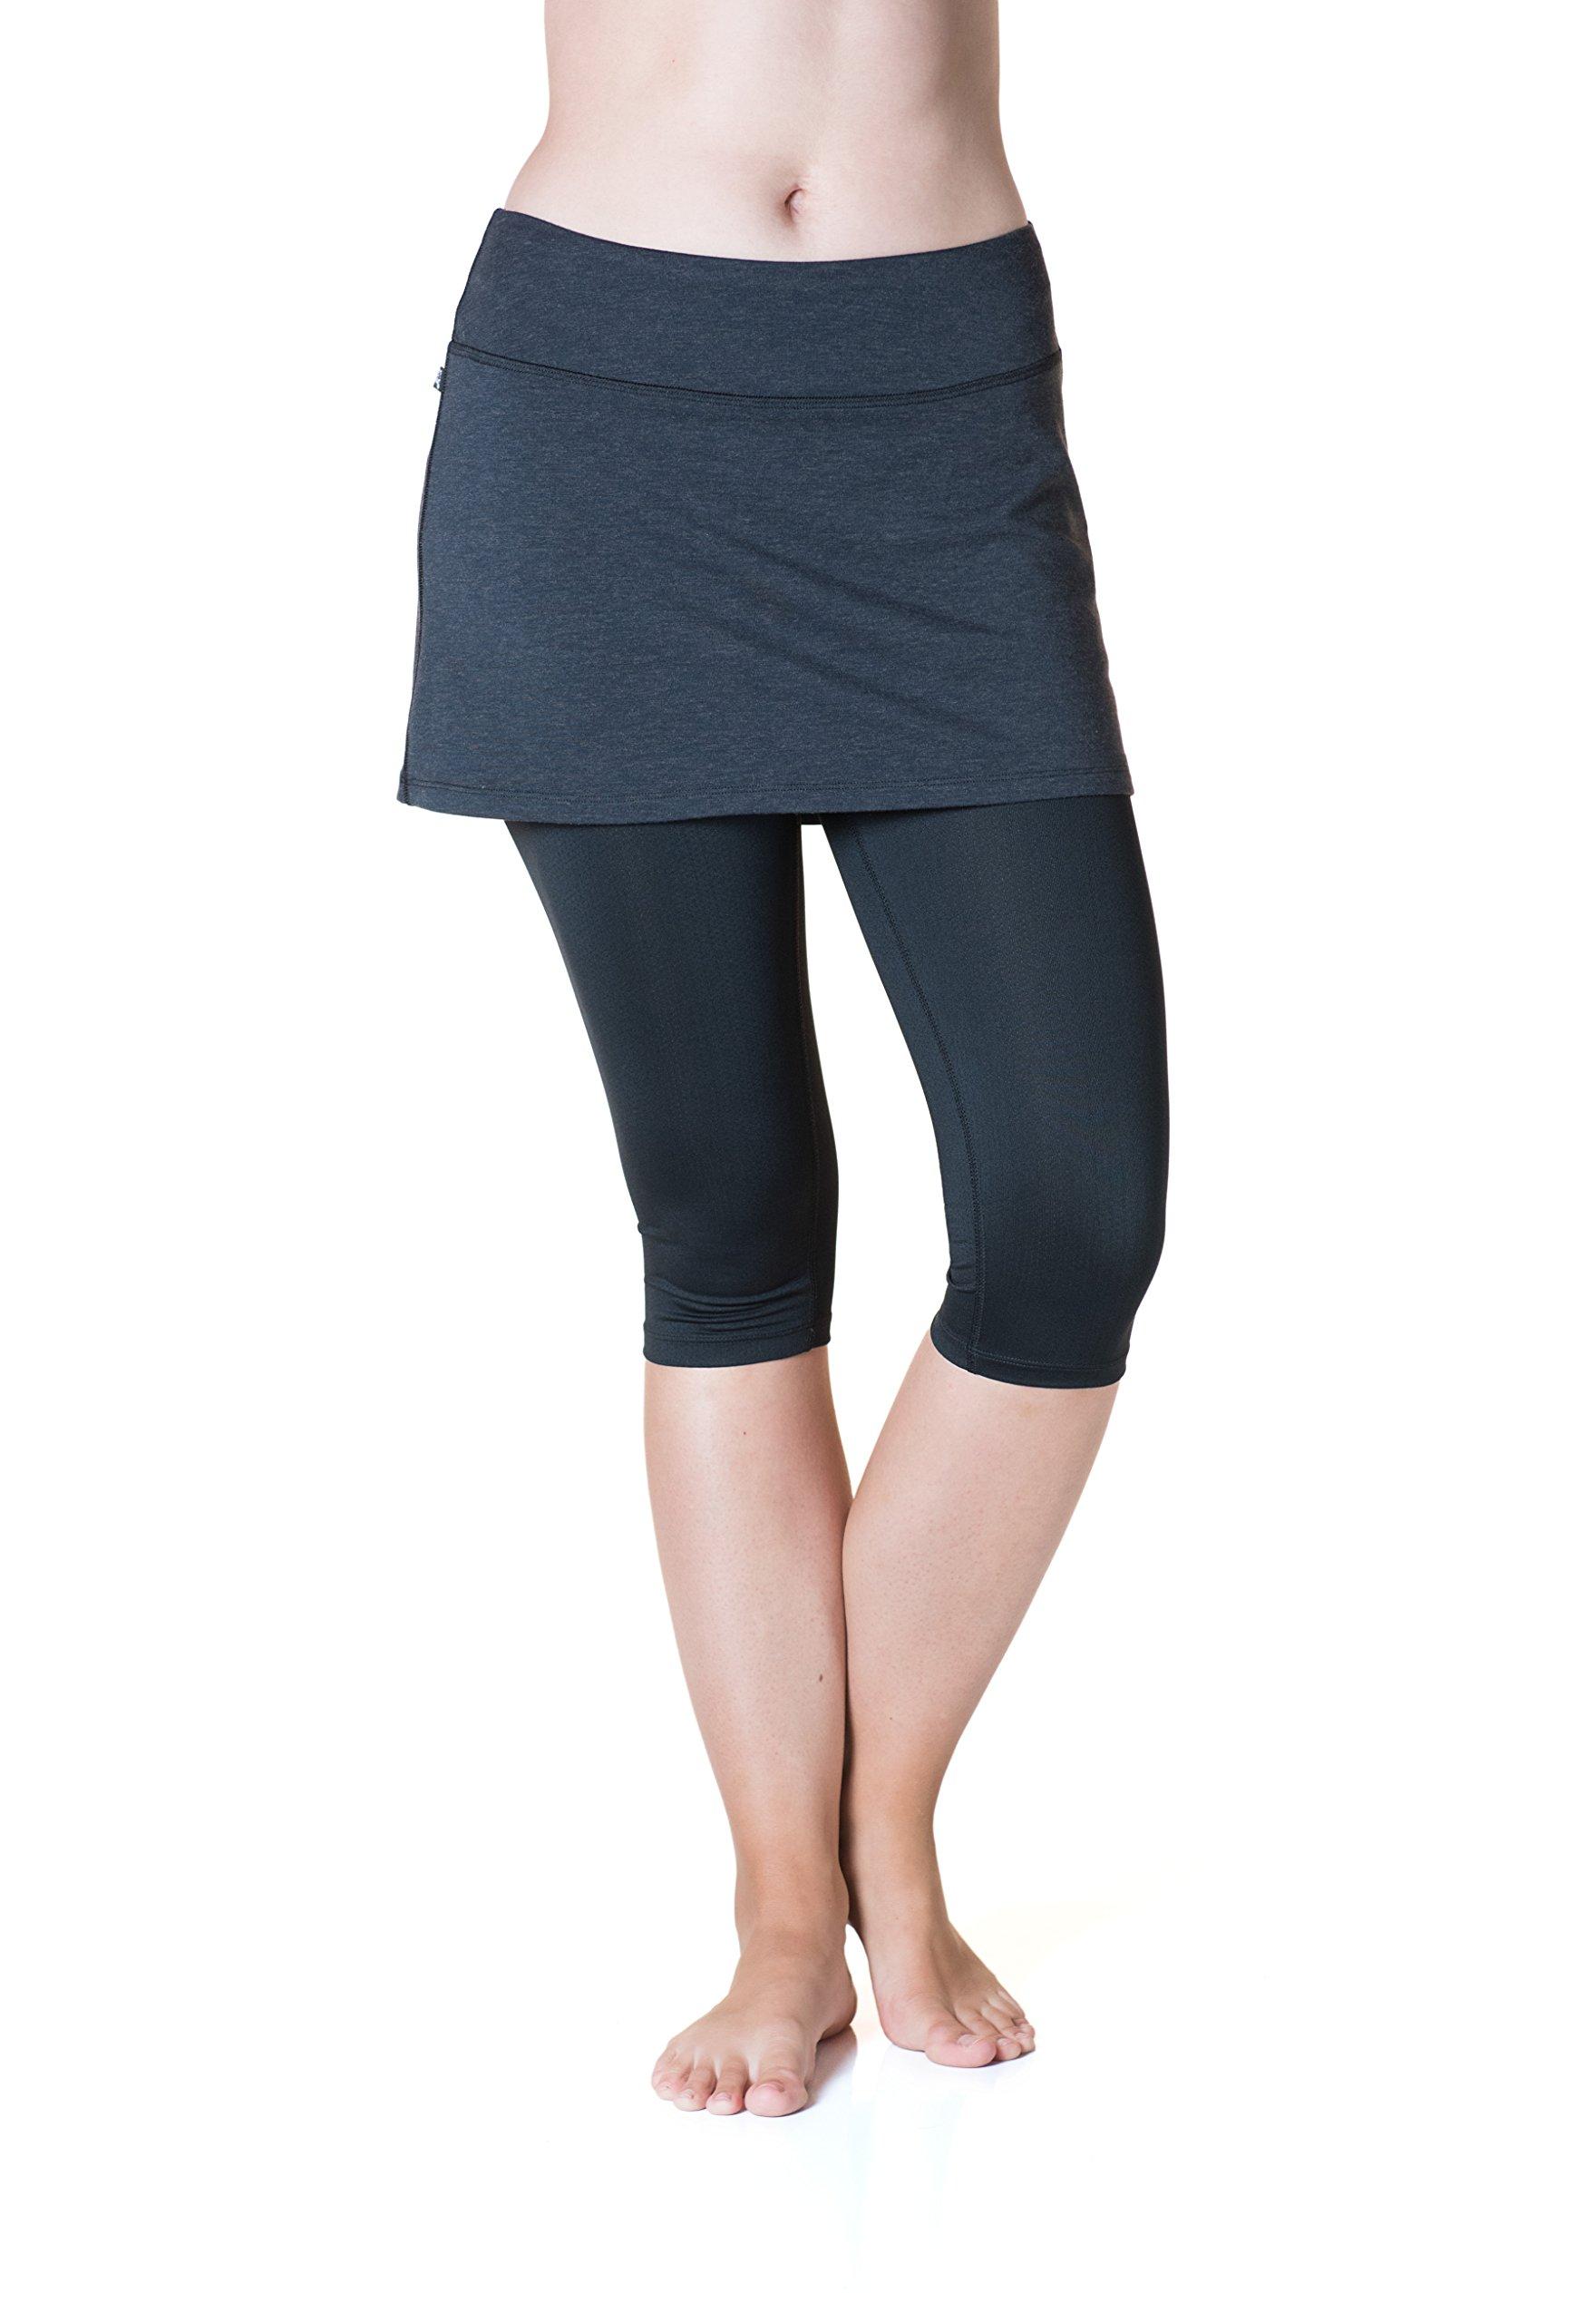 Skirt Sports Women's Lotta Breeze Capri Skirt, Wool/Black, Small by Skirt Sports